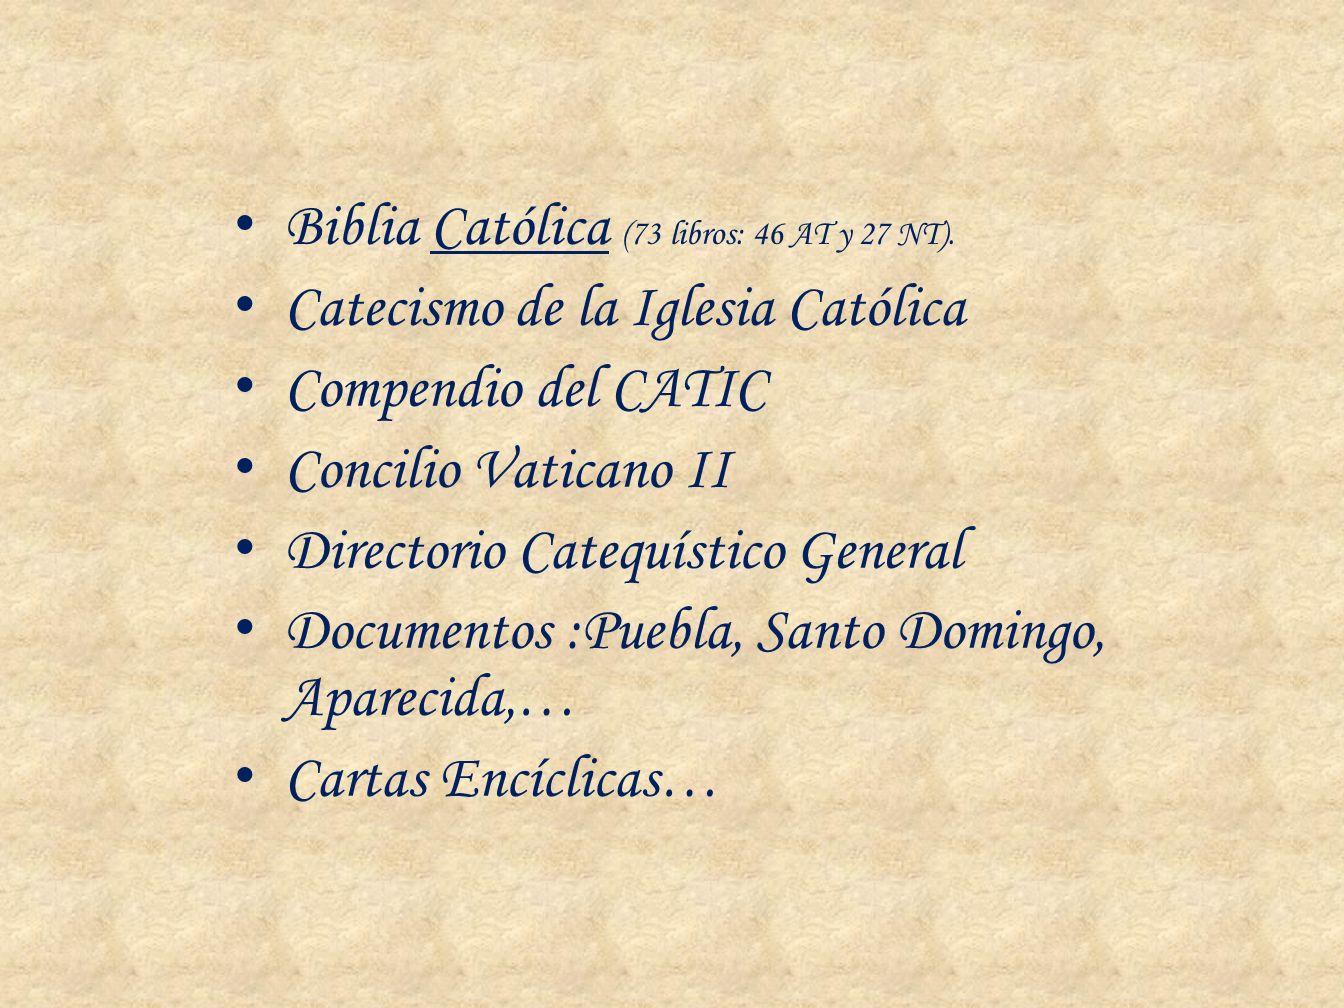 Biblia Católica (73 libros: 46 AT y 27 NT). Catecismo de la Iglesia Católica Compendio del CATIC Concilio Vaticano II Directorio Catequístico General